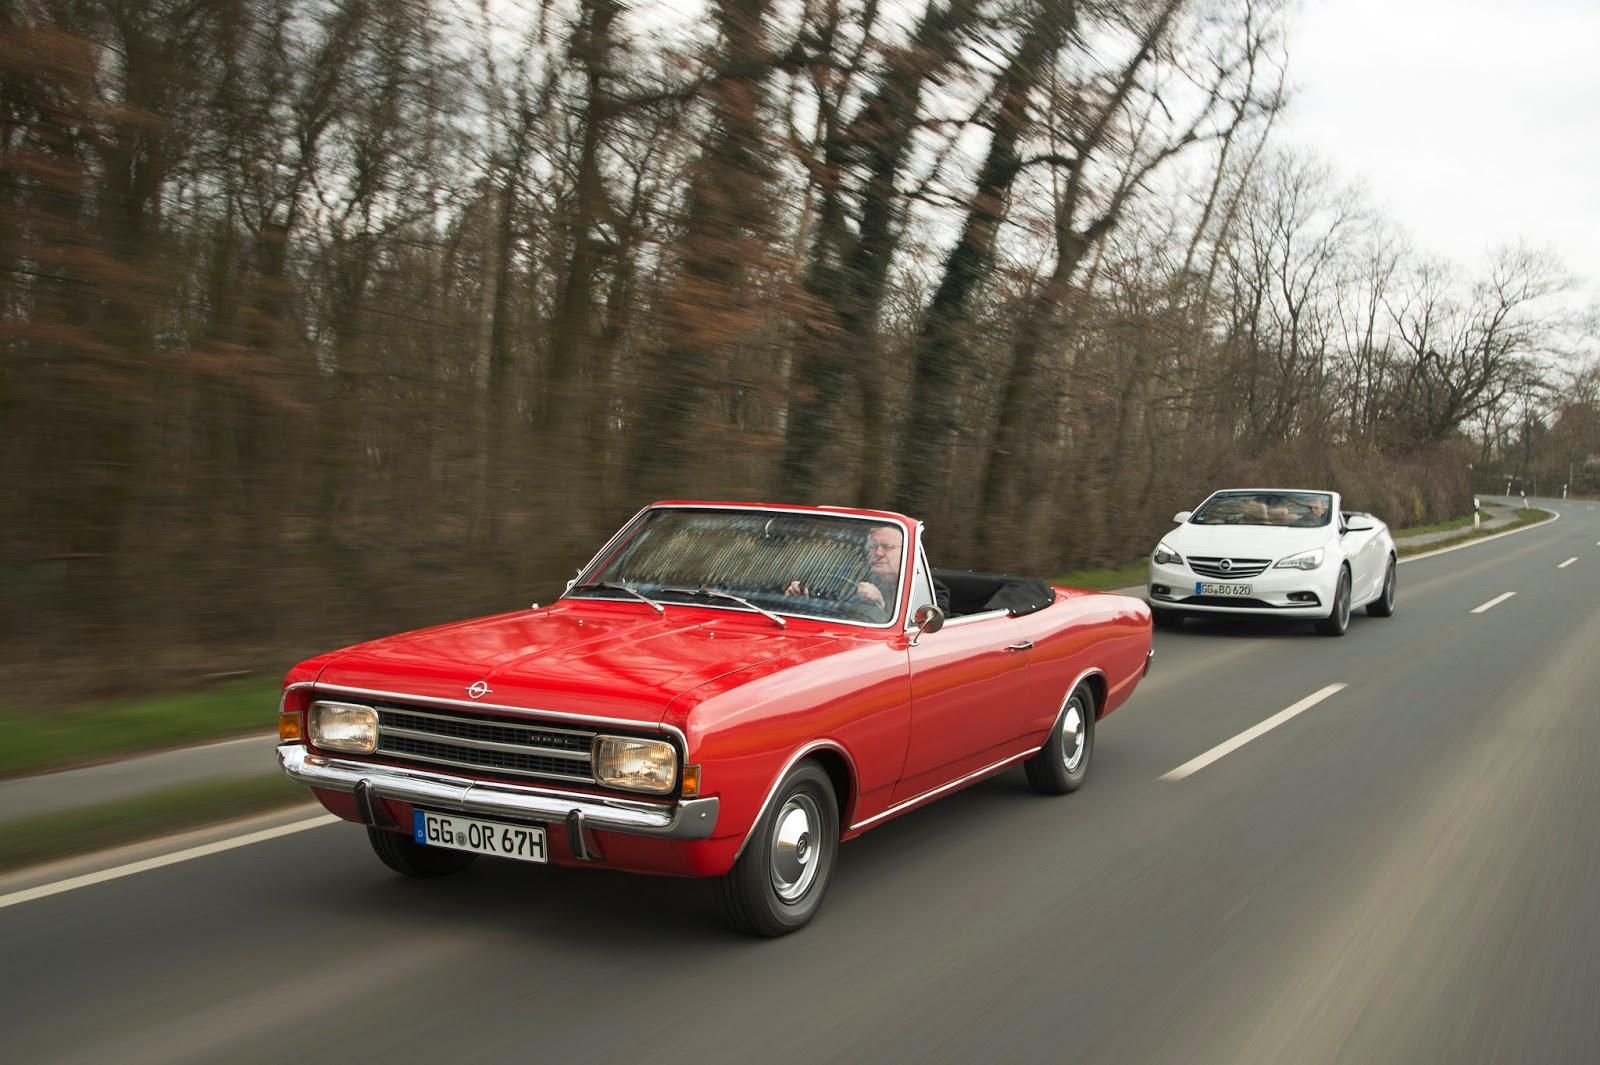 Opel Rallye Hessen Th25C325BCringen 301758 H Πλούσια Κληρονομιά των Opel Cabrio cabrio, Opel, Opel 8/25 hp, Opel Cascada, Opel Olympia, Opel Record, Opel Super 6